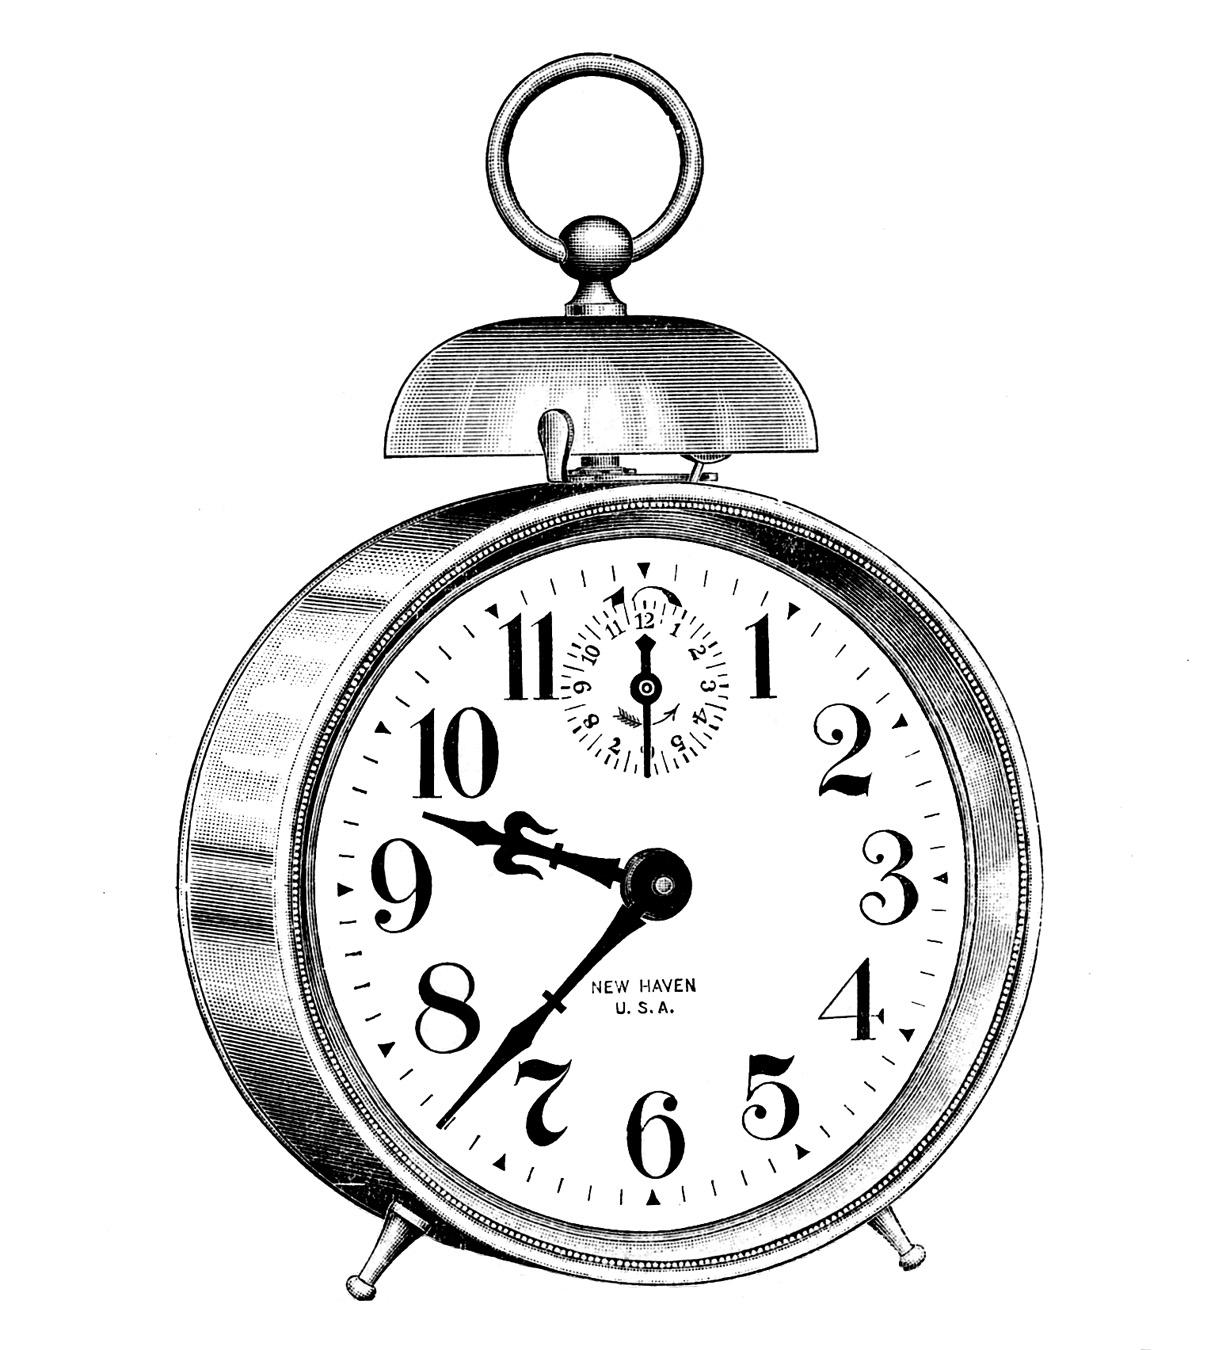 alarm+clock+vintage+image+graphicsfairy7b.jpg